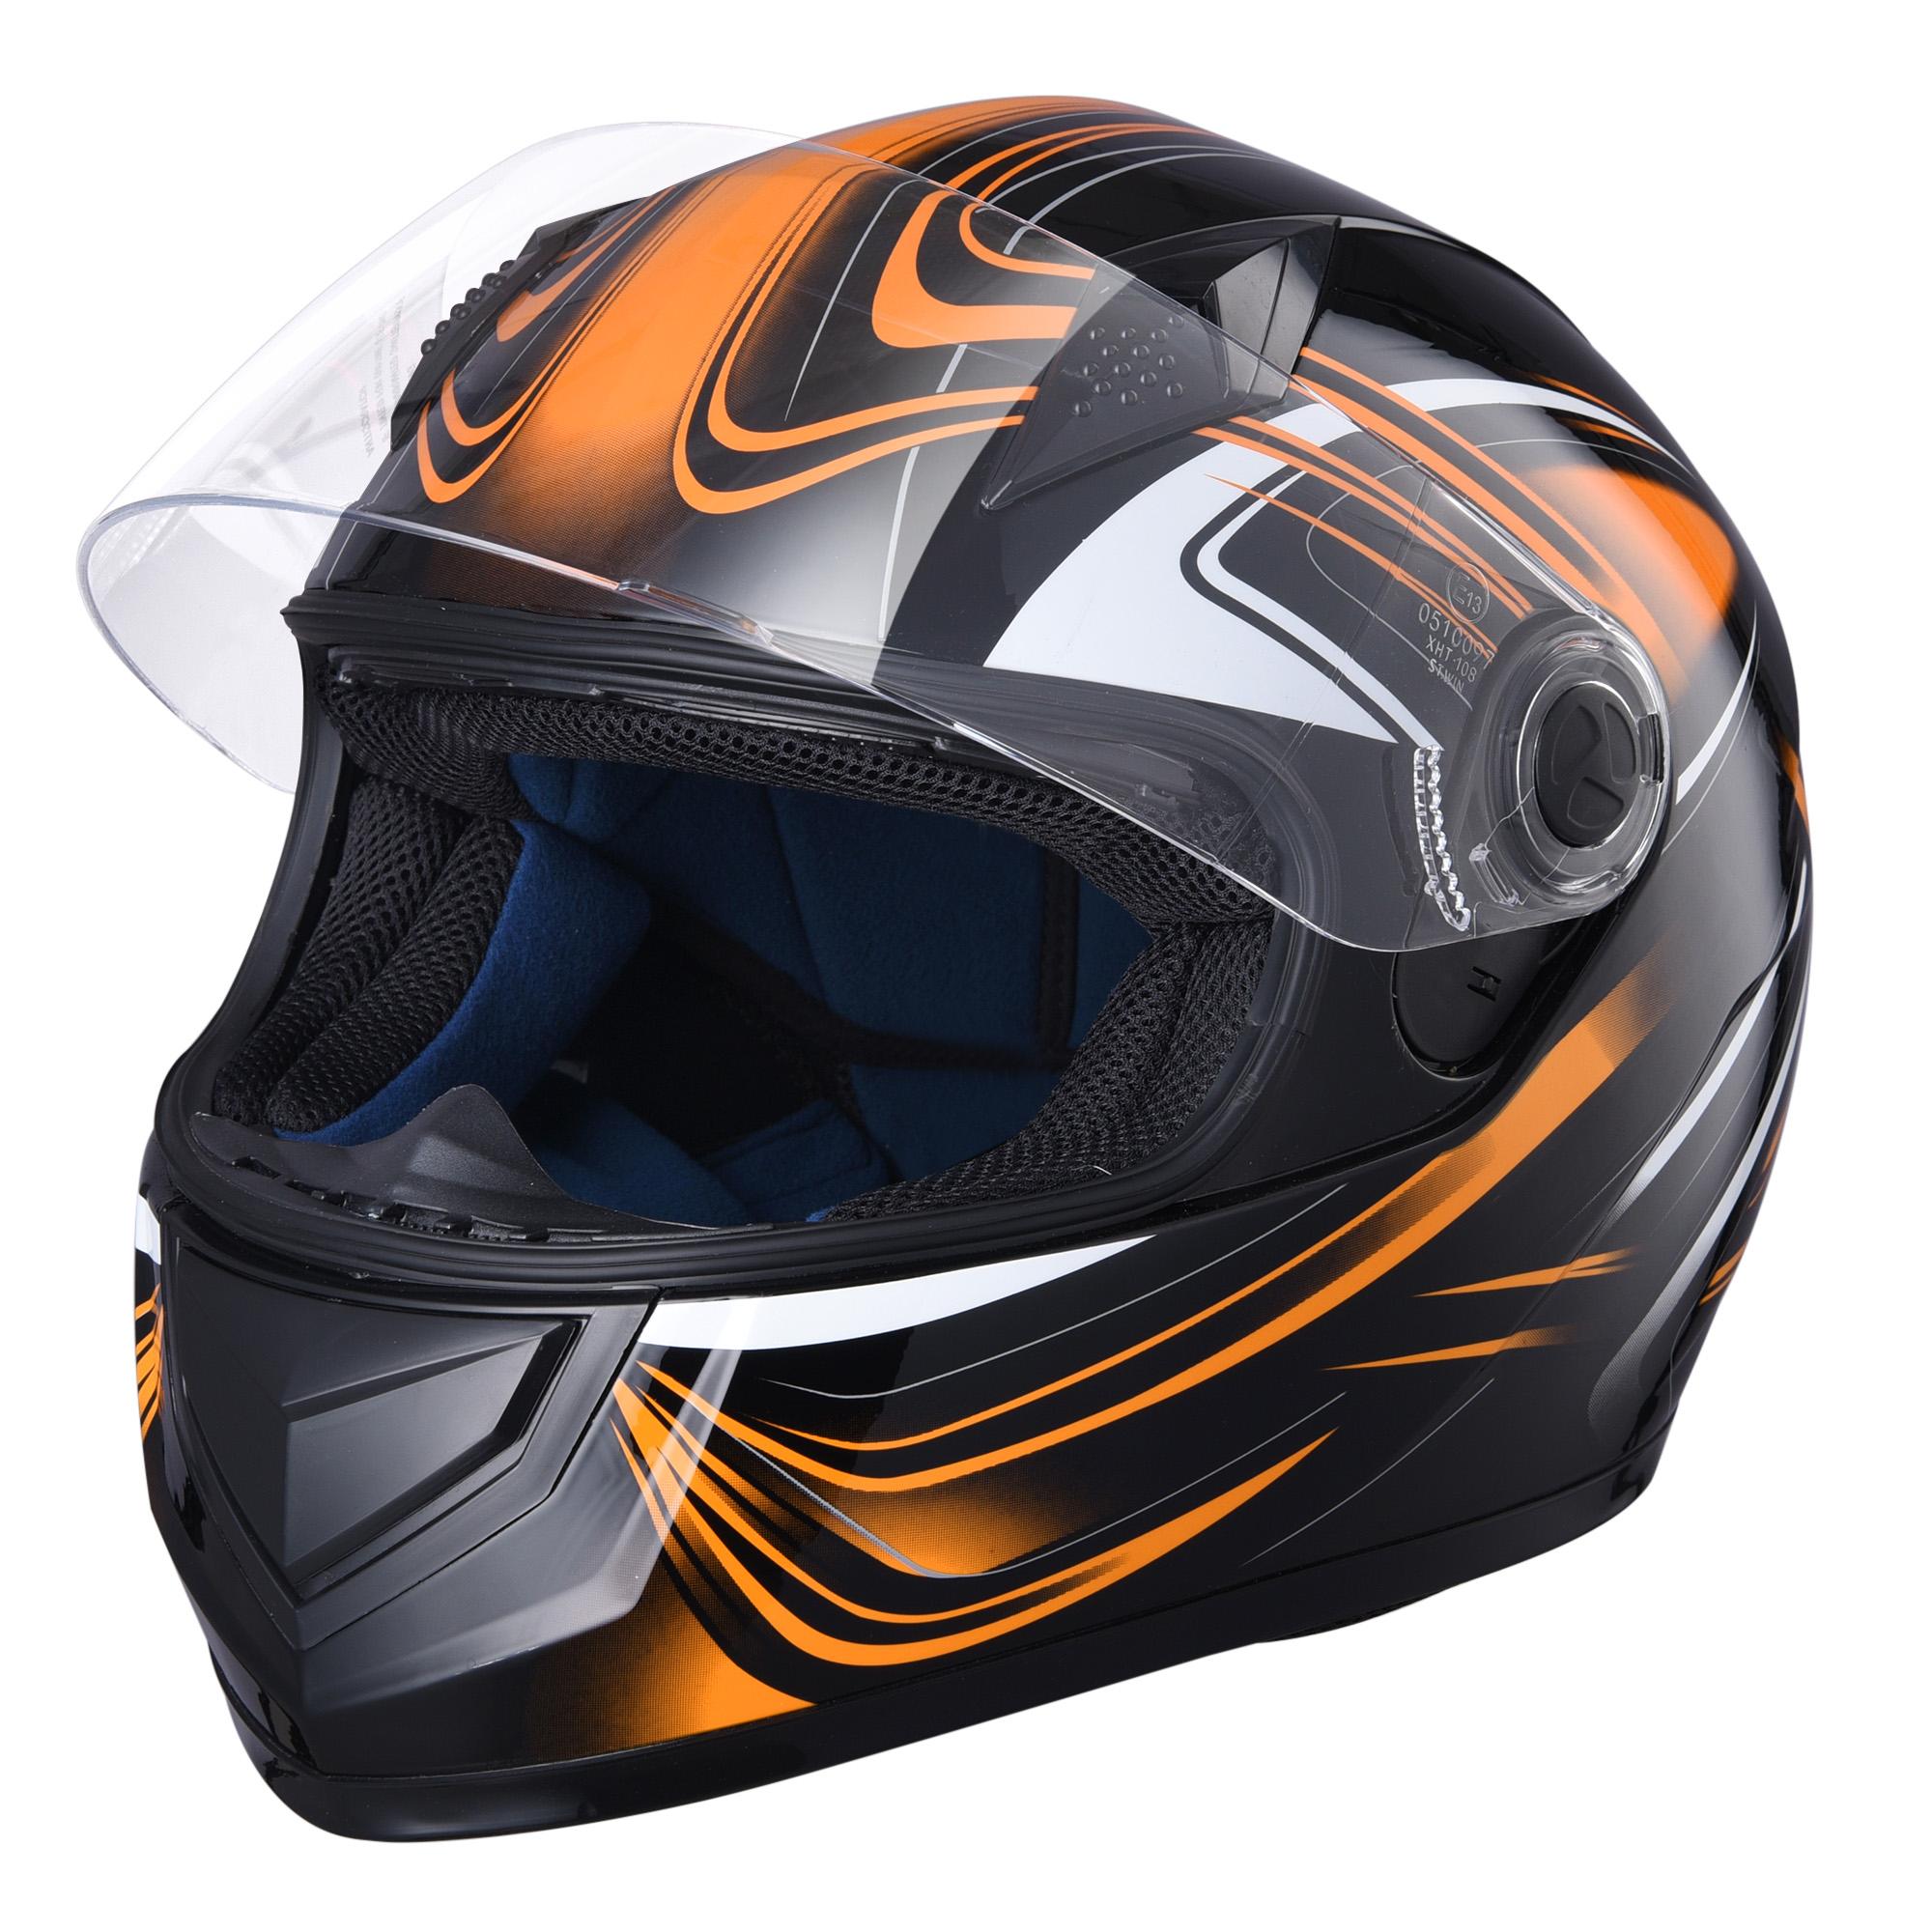 miniature 38 - AHR K12 Full Face Motorcycle Helmet DOT Air Vents Clear Visor Racing S M L XL